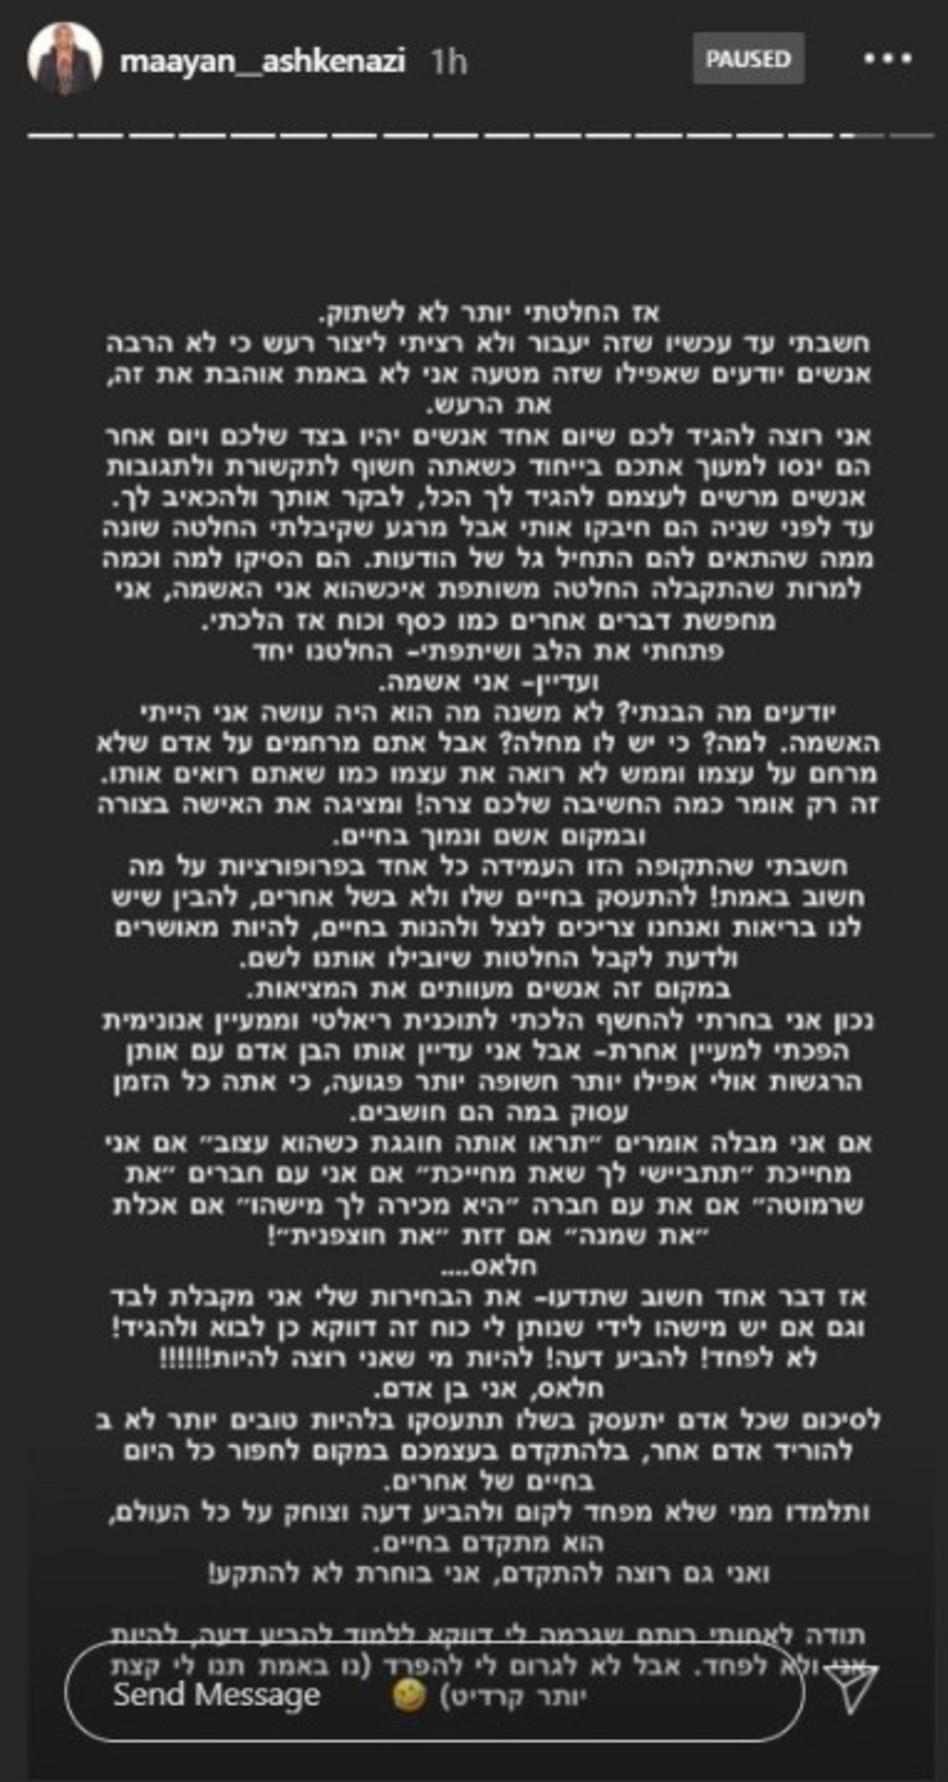 מעיין אשכנזי (צילום: צילום מסך אינסטגרם)